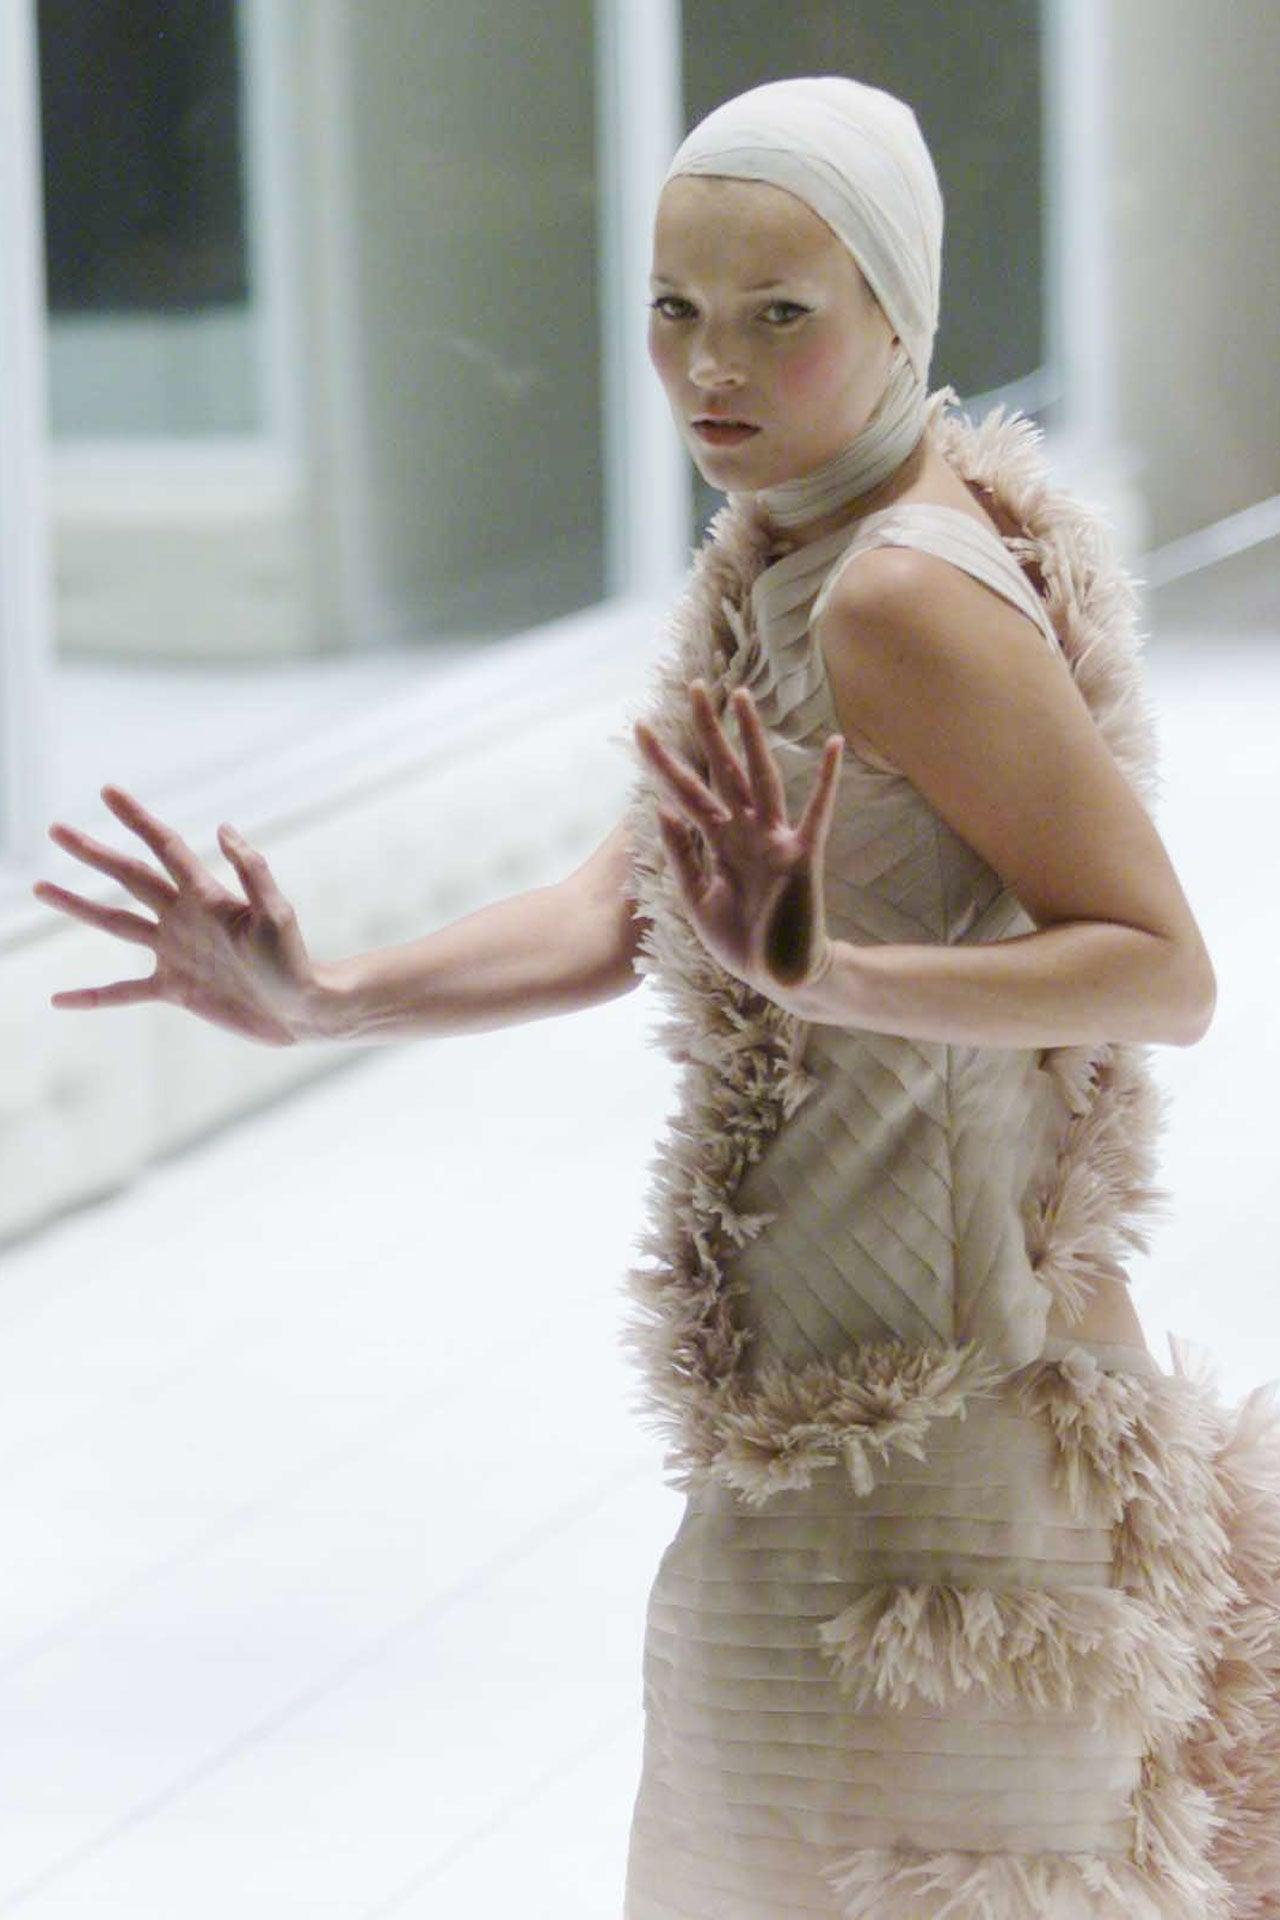 Kate Moss, London Fashion Week, září 2000 Autor: Cavan Pawson/Evening Standard/REX/Shutterstock